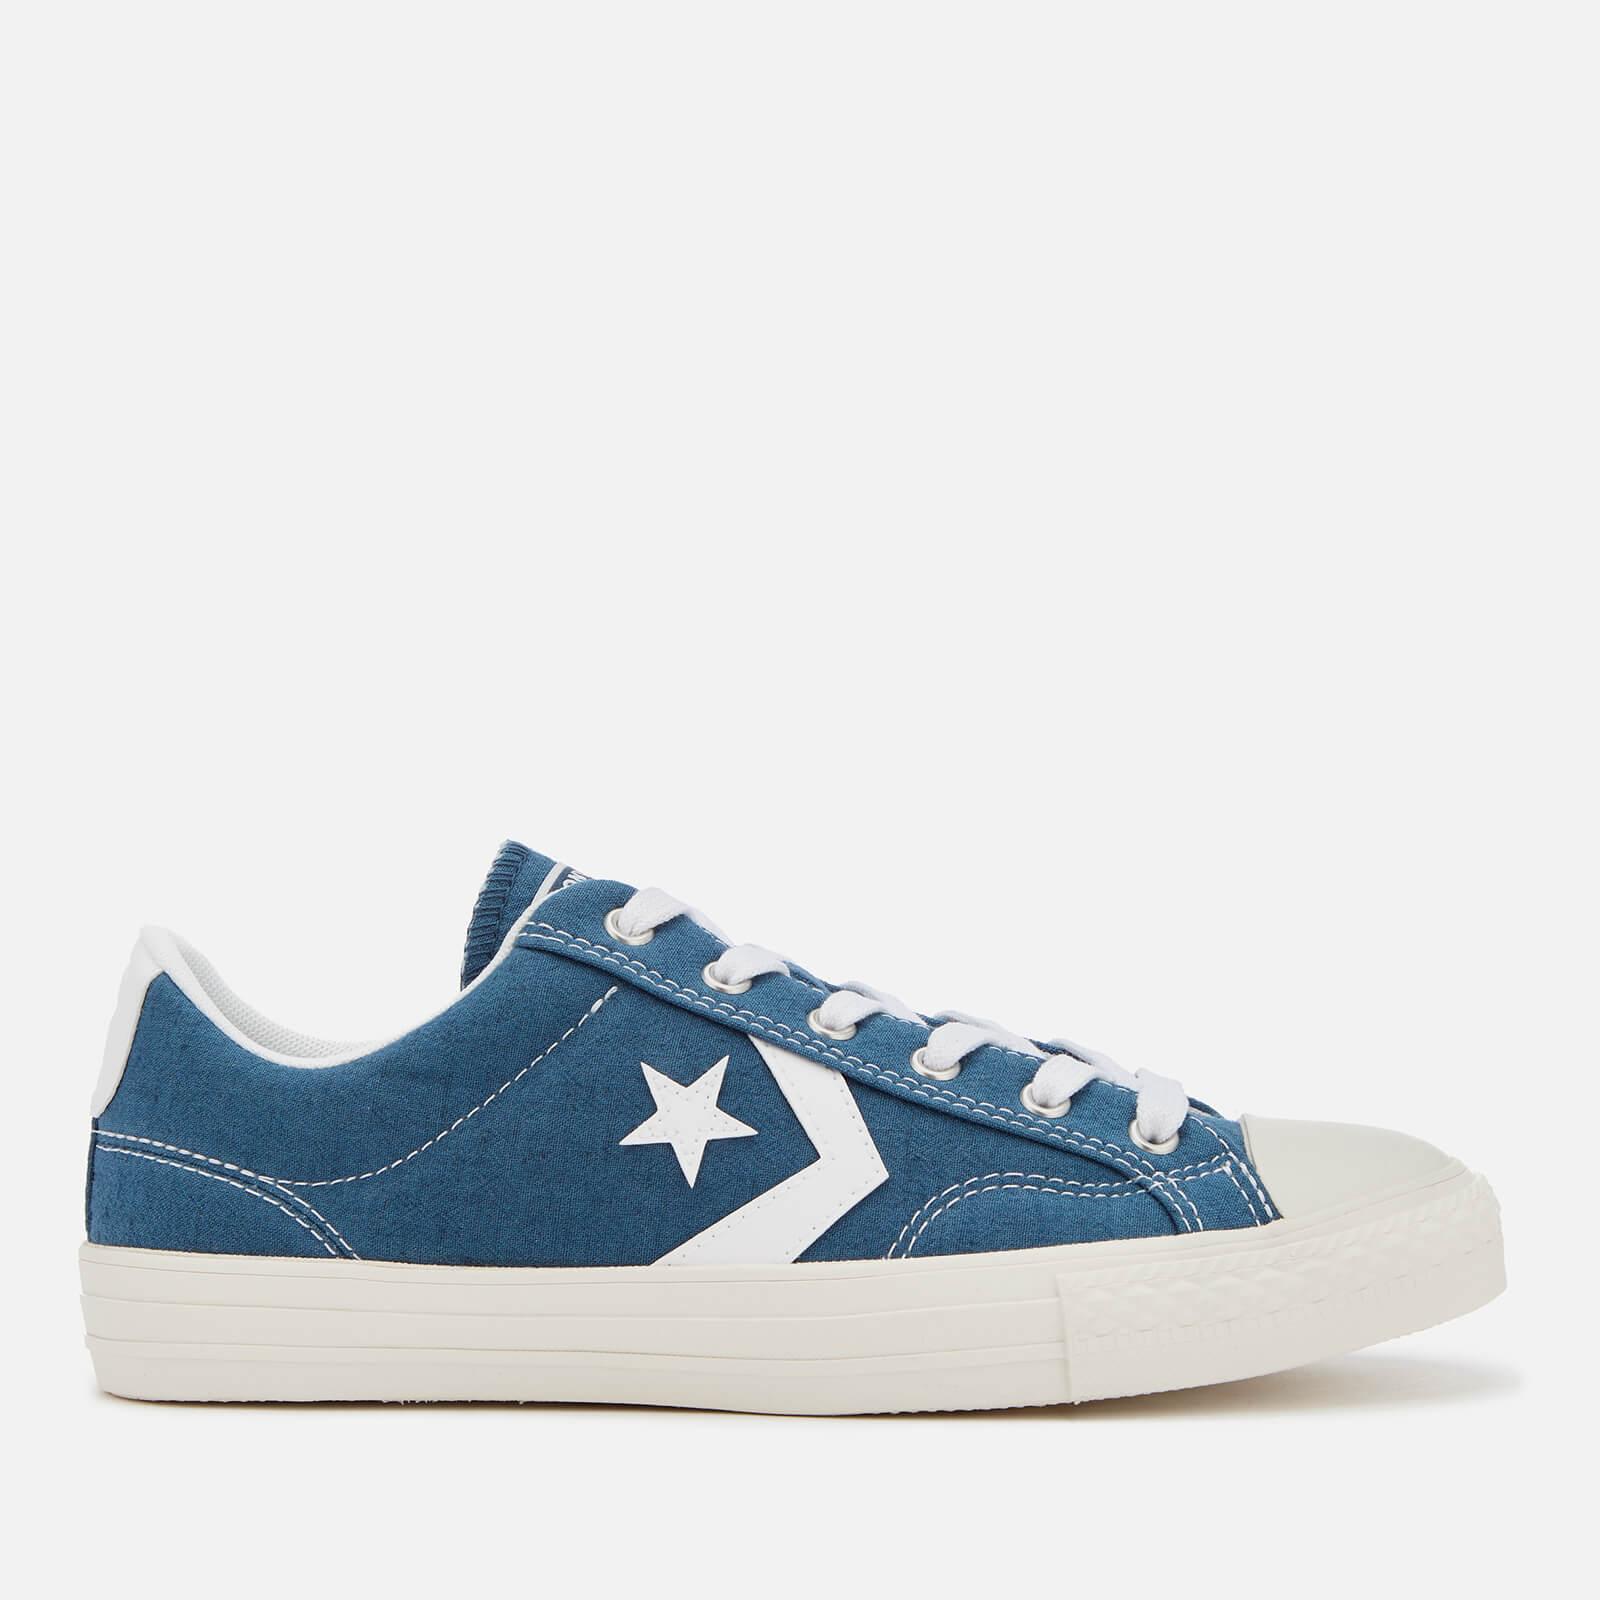 661fc0c5624fe6 Converse Men s Star Player Ox Trainers - Mason Blue White Mens Footwear